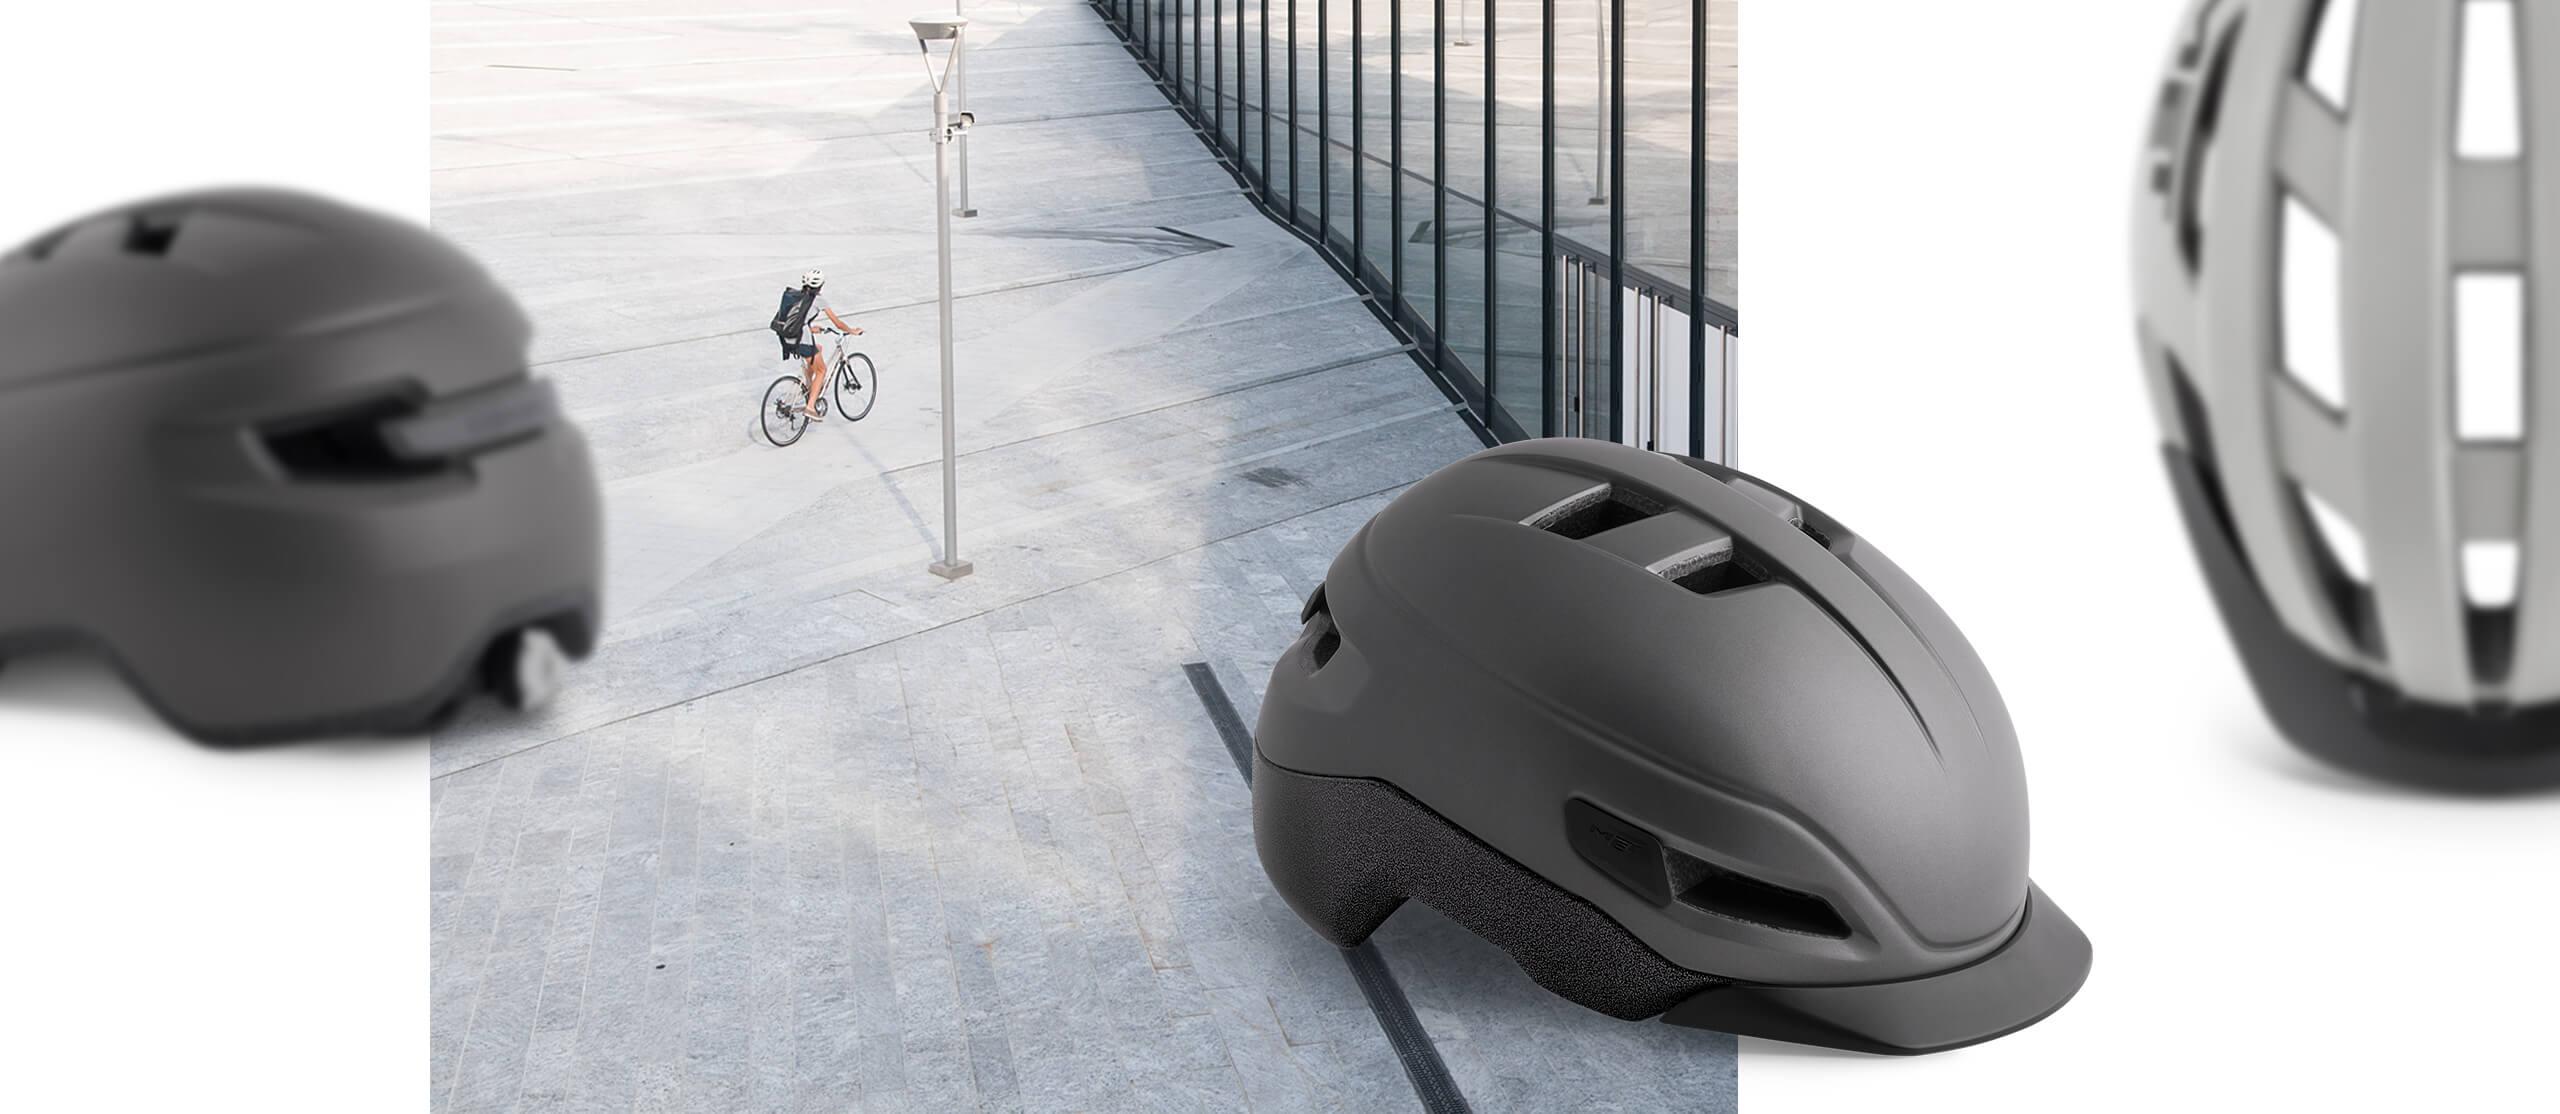 MET Helmets specialisti nei caschi da e-bike e commuting